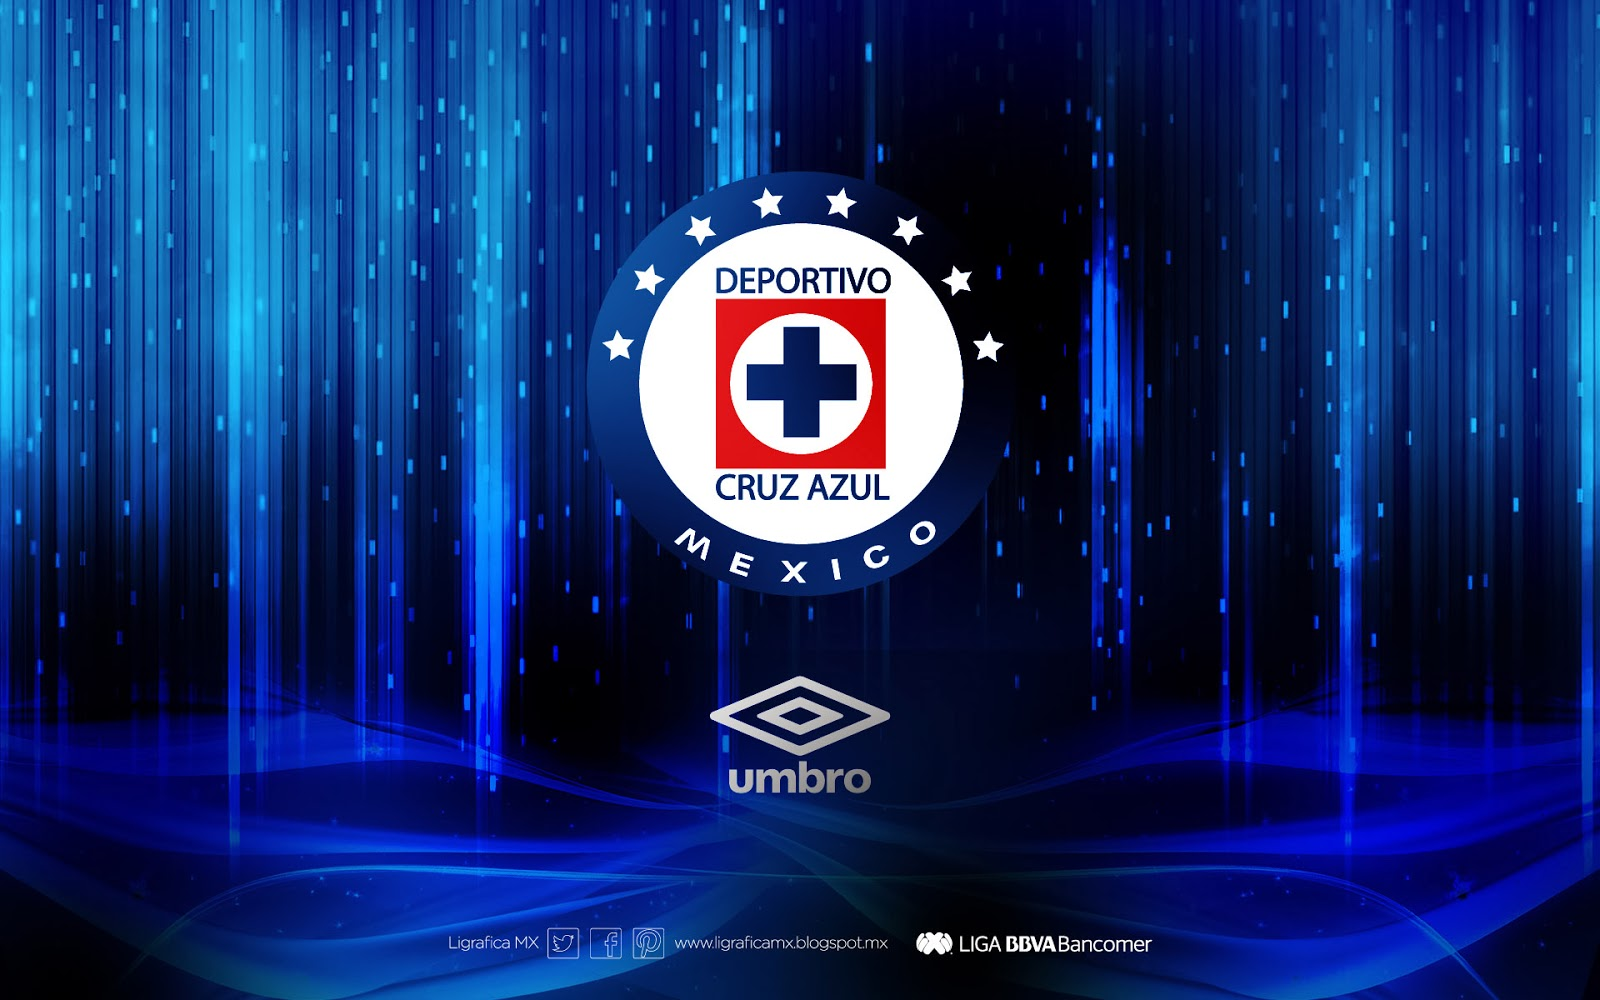 Club America Wallpaper 3d Ligrafica Mx Liga Bancomer Mx Wallpapers 02112013ctg 2